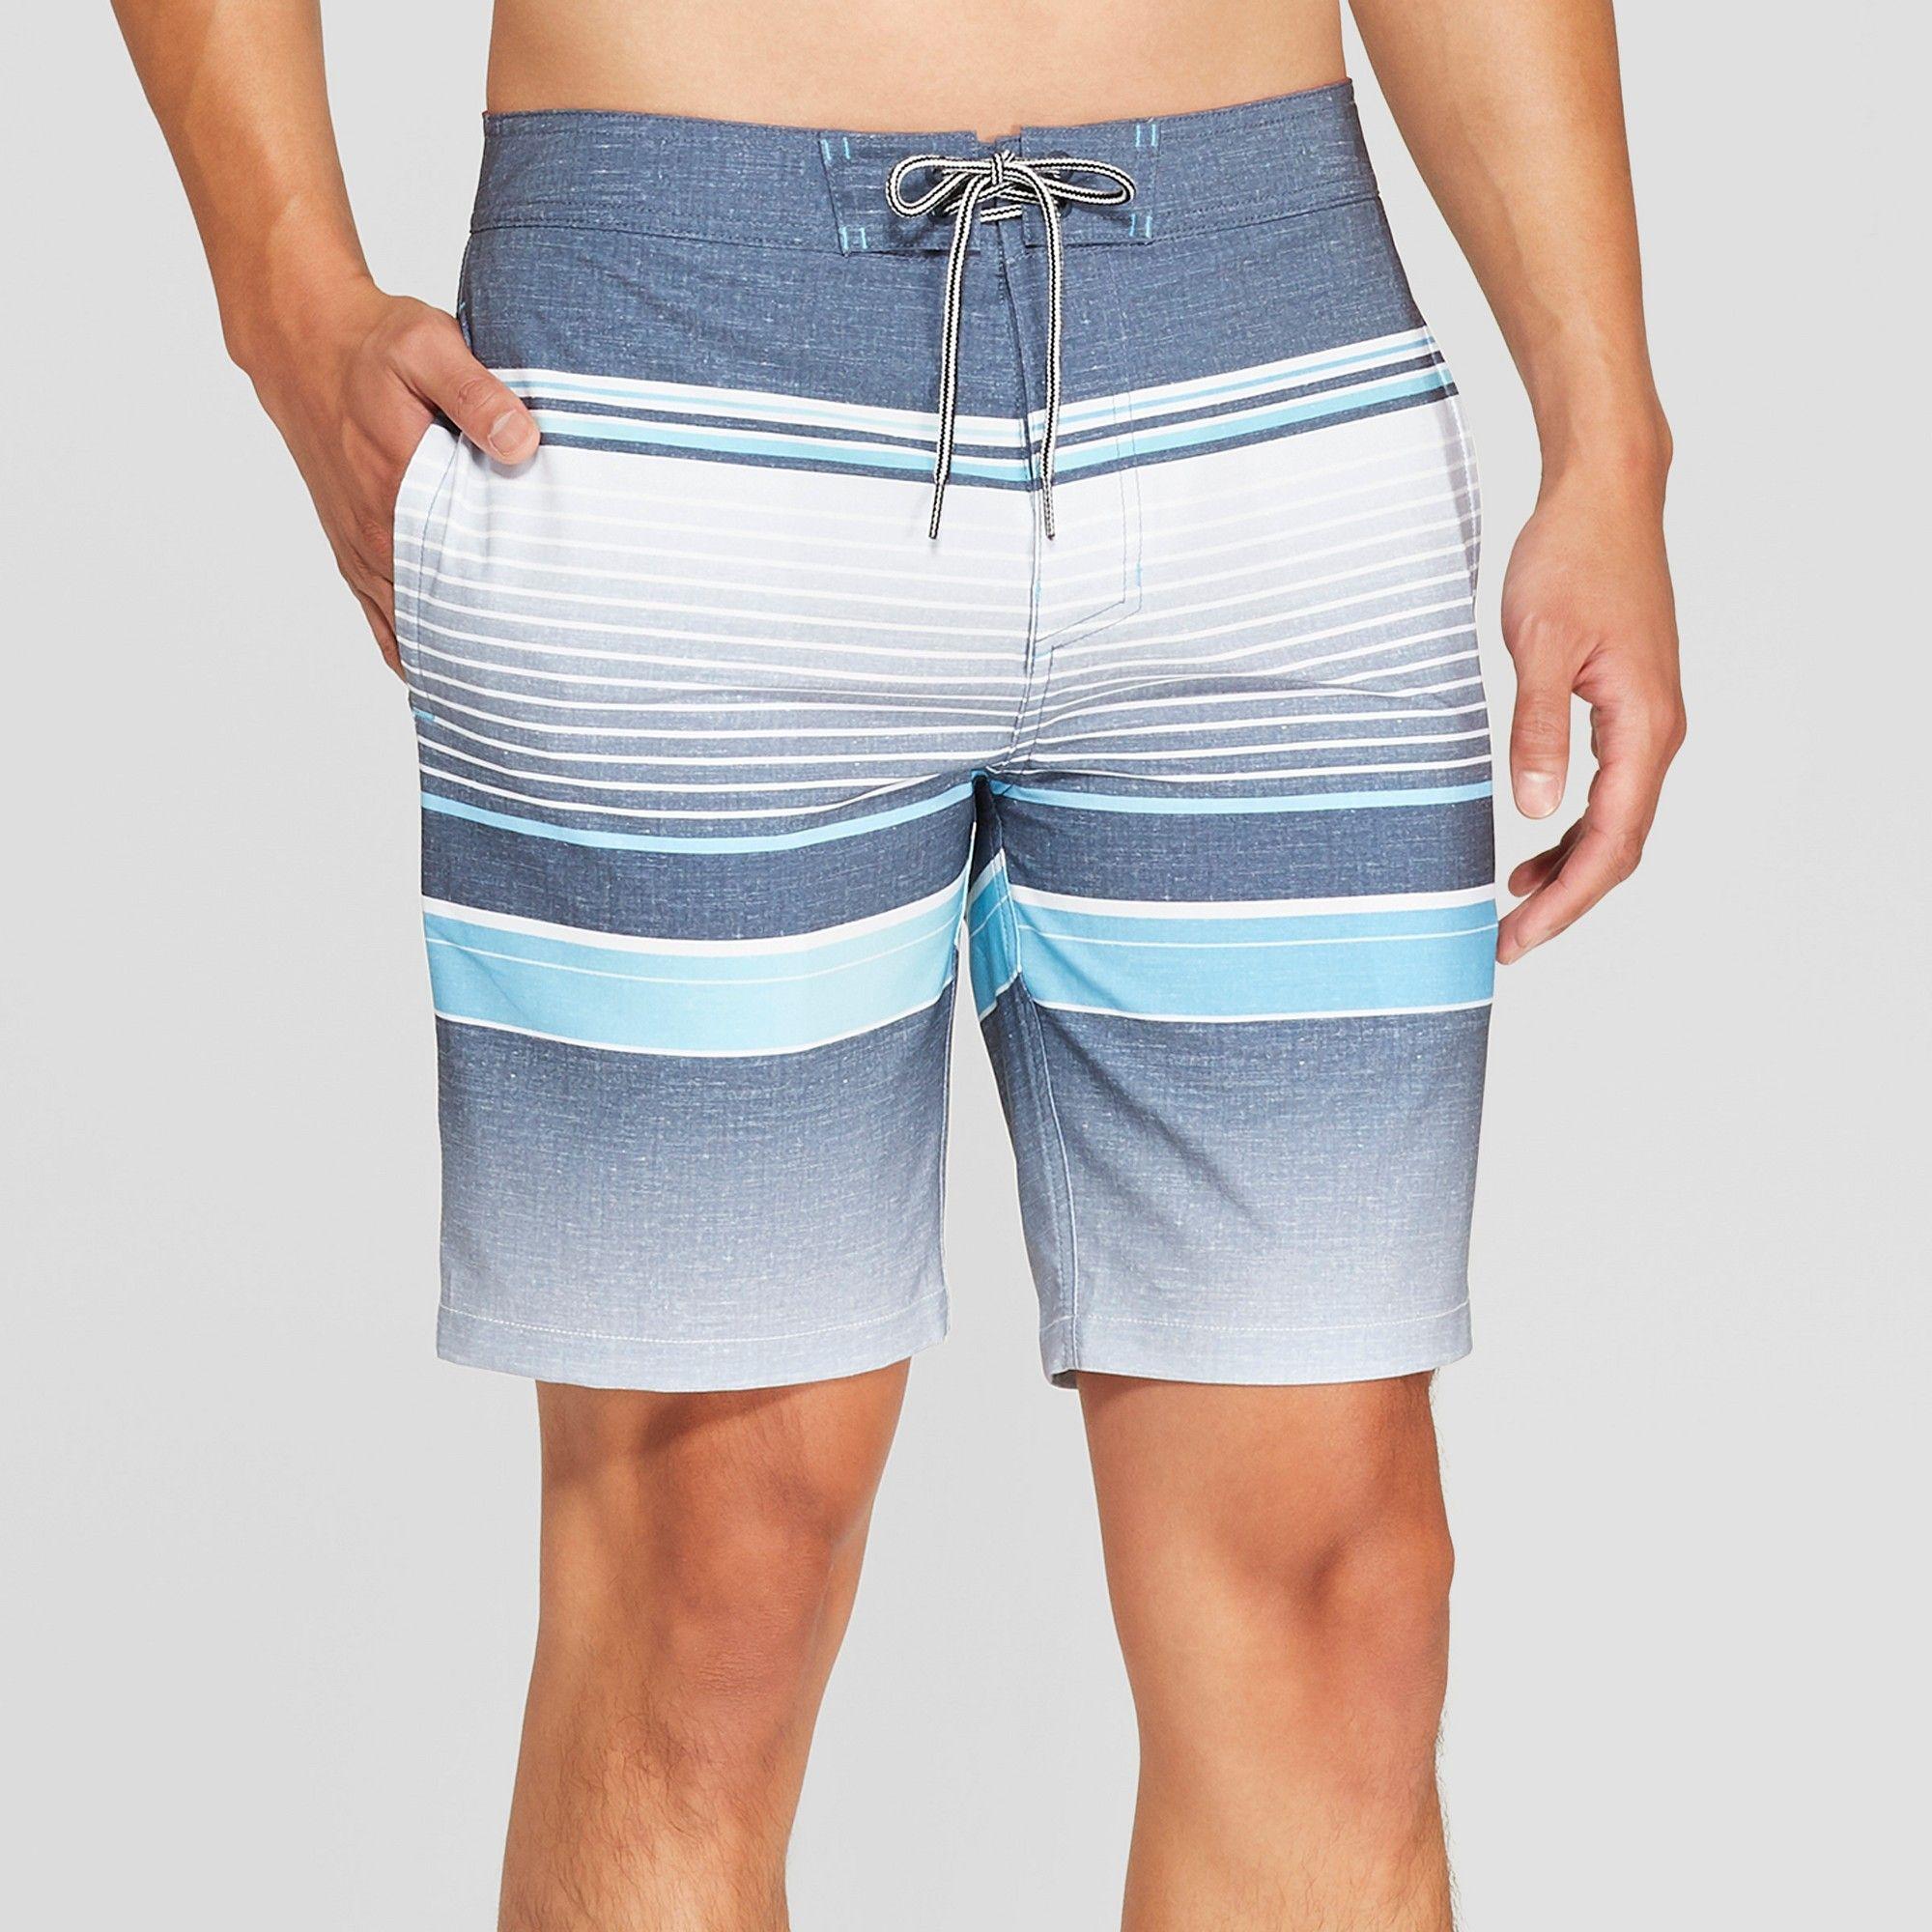 cc3810d0d4 Men's 8.5 Striped Bojack Board Shorts - Goodfellow & Co Indigo 36, Blue